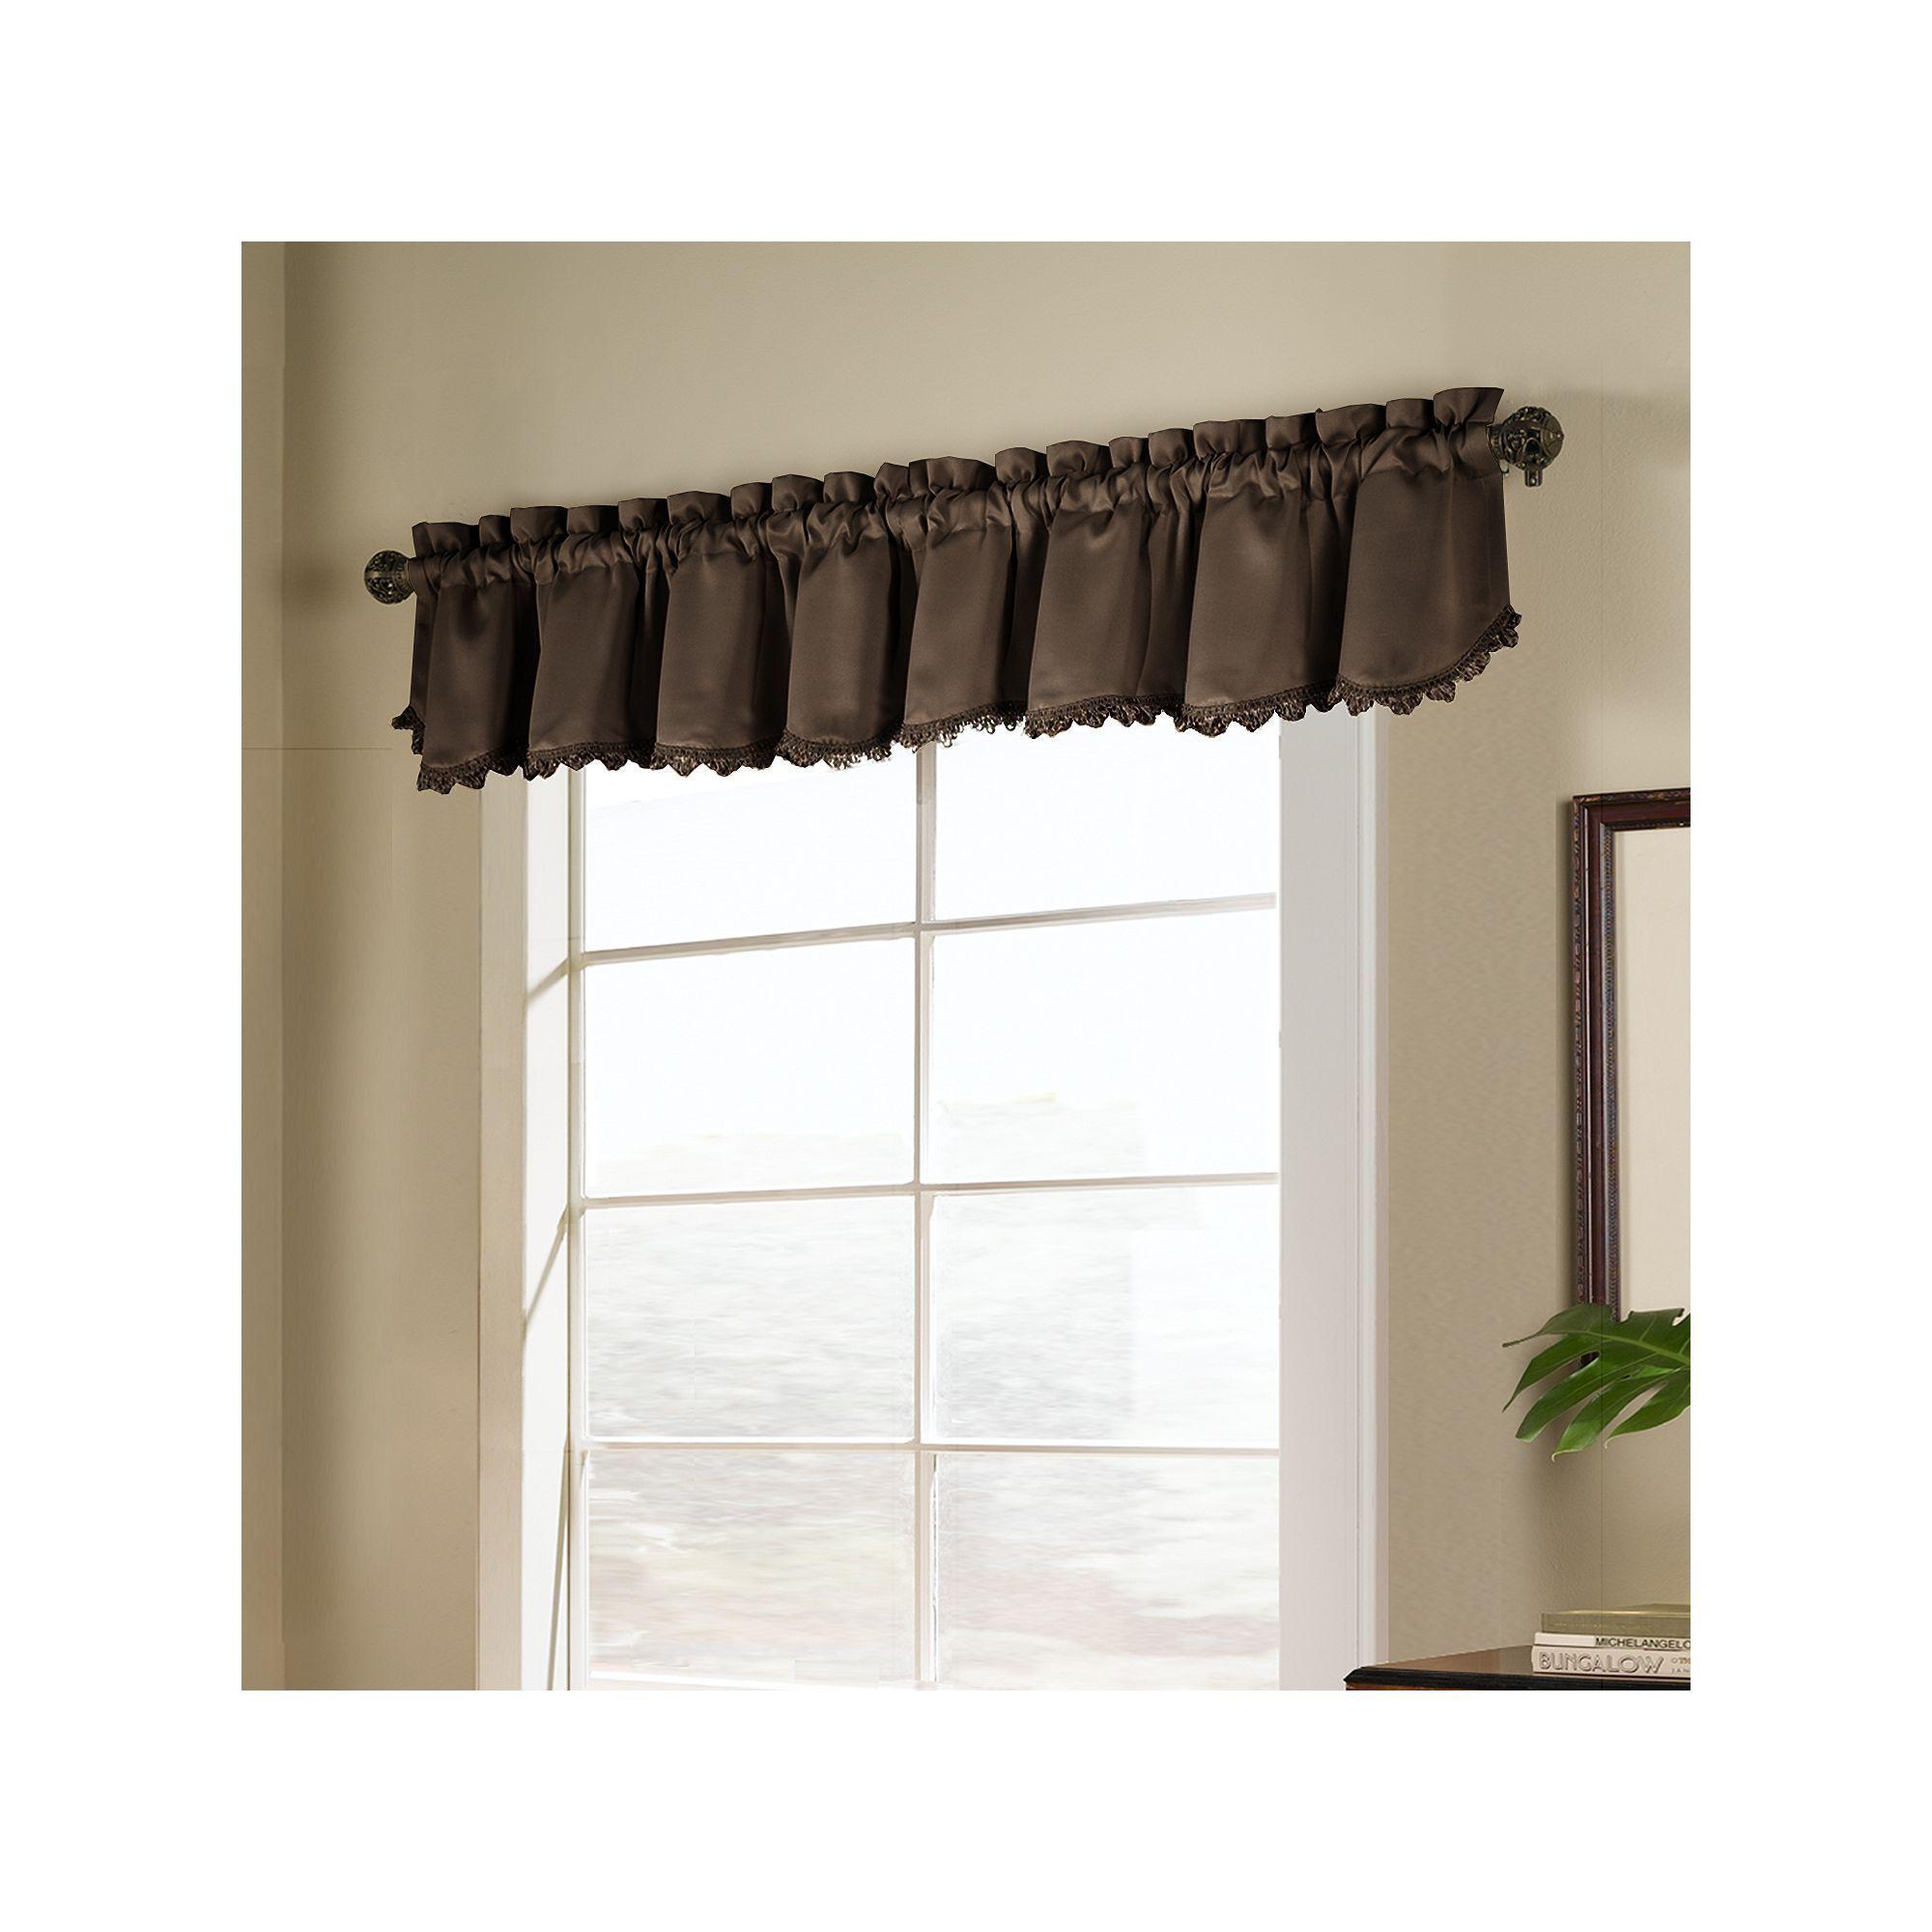 United Curtain Co Blackstone Blackout Window Valance Curtains